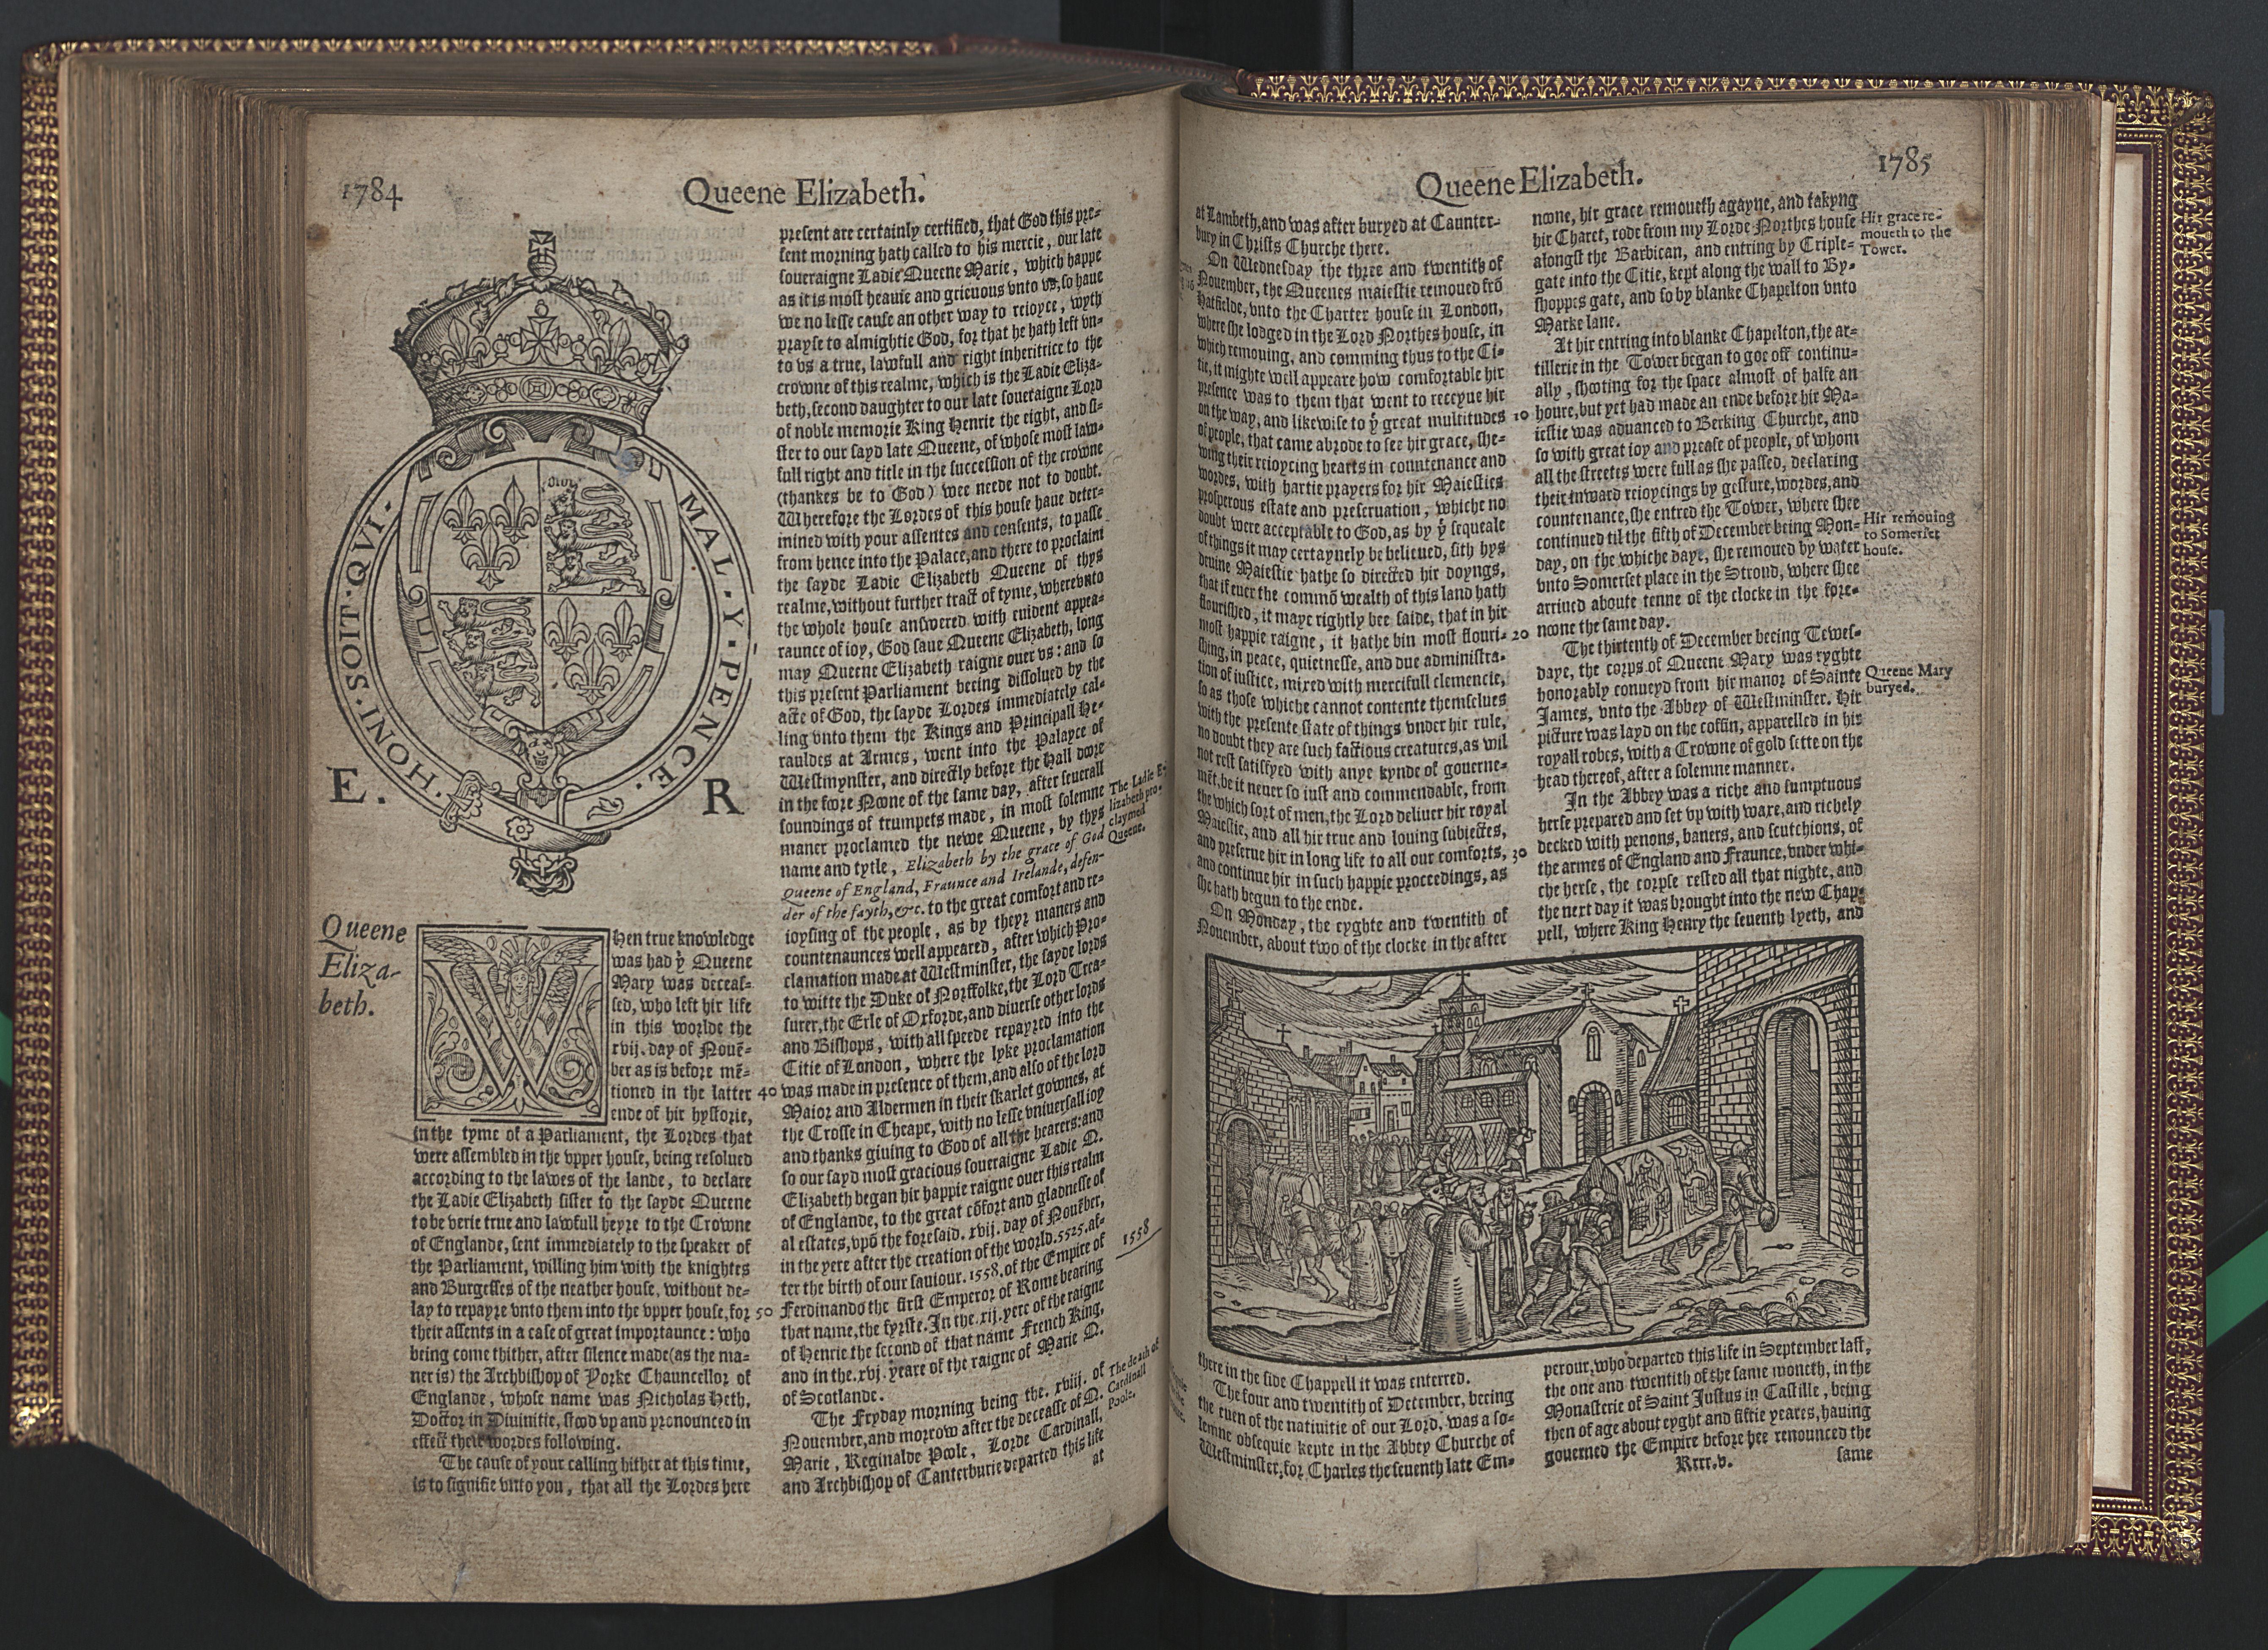 http://blogs.princeton.edu/rarebooks/images/Ex1426.272.11.v.2.Eliz.jpg